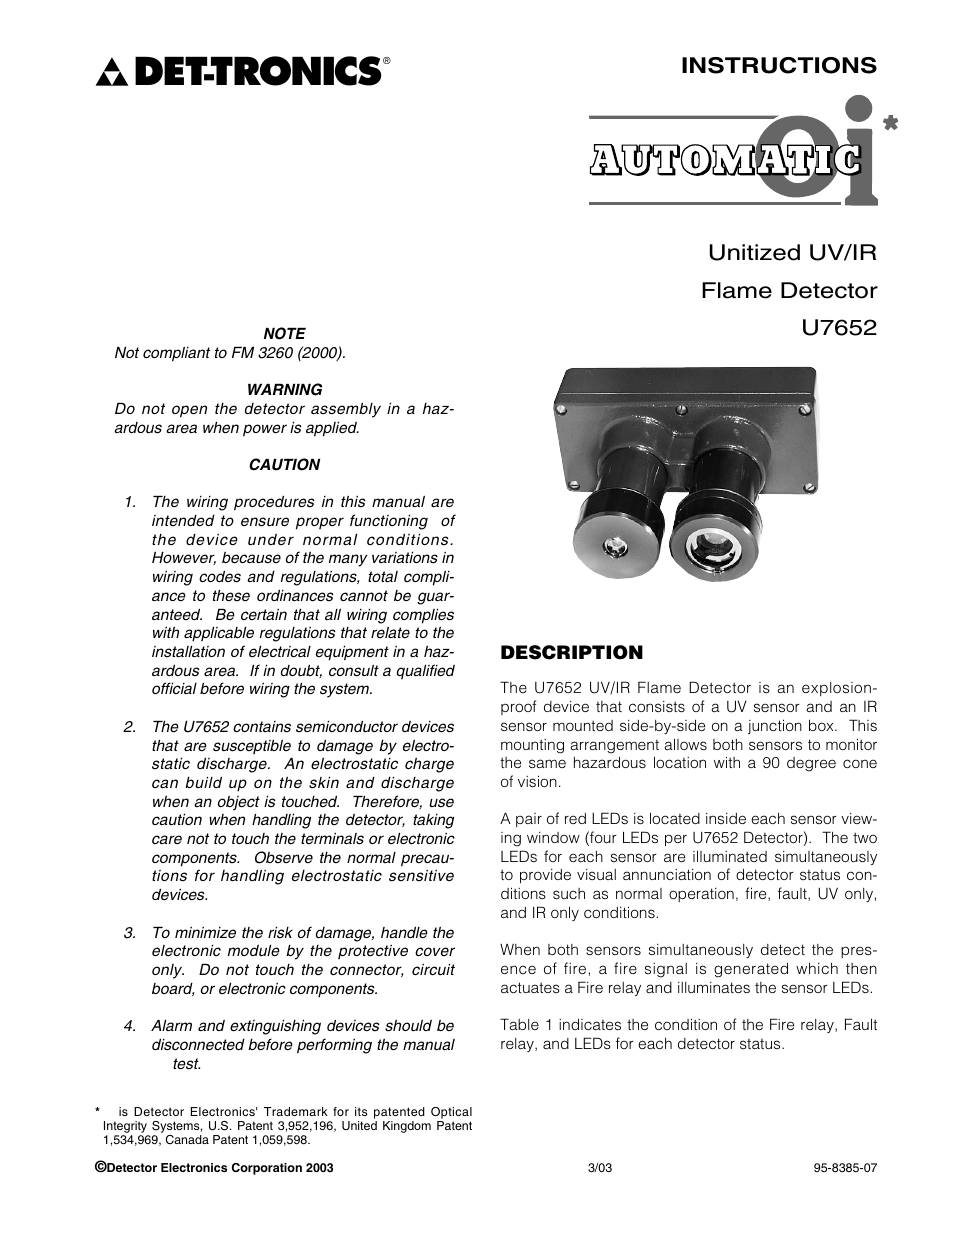 medium resolution of tronics instructions unitized uv ir flame detector u7652 det tronics u7652b c unitized uv ir flame detector user manual page 3 22